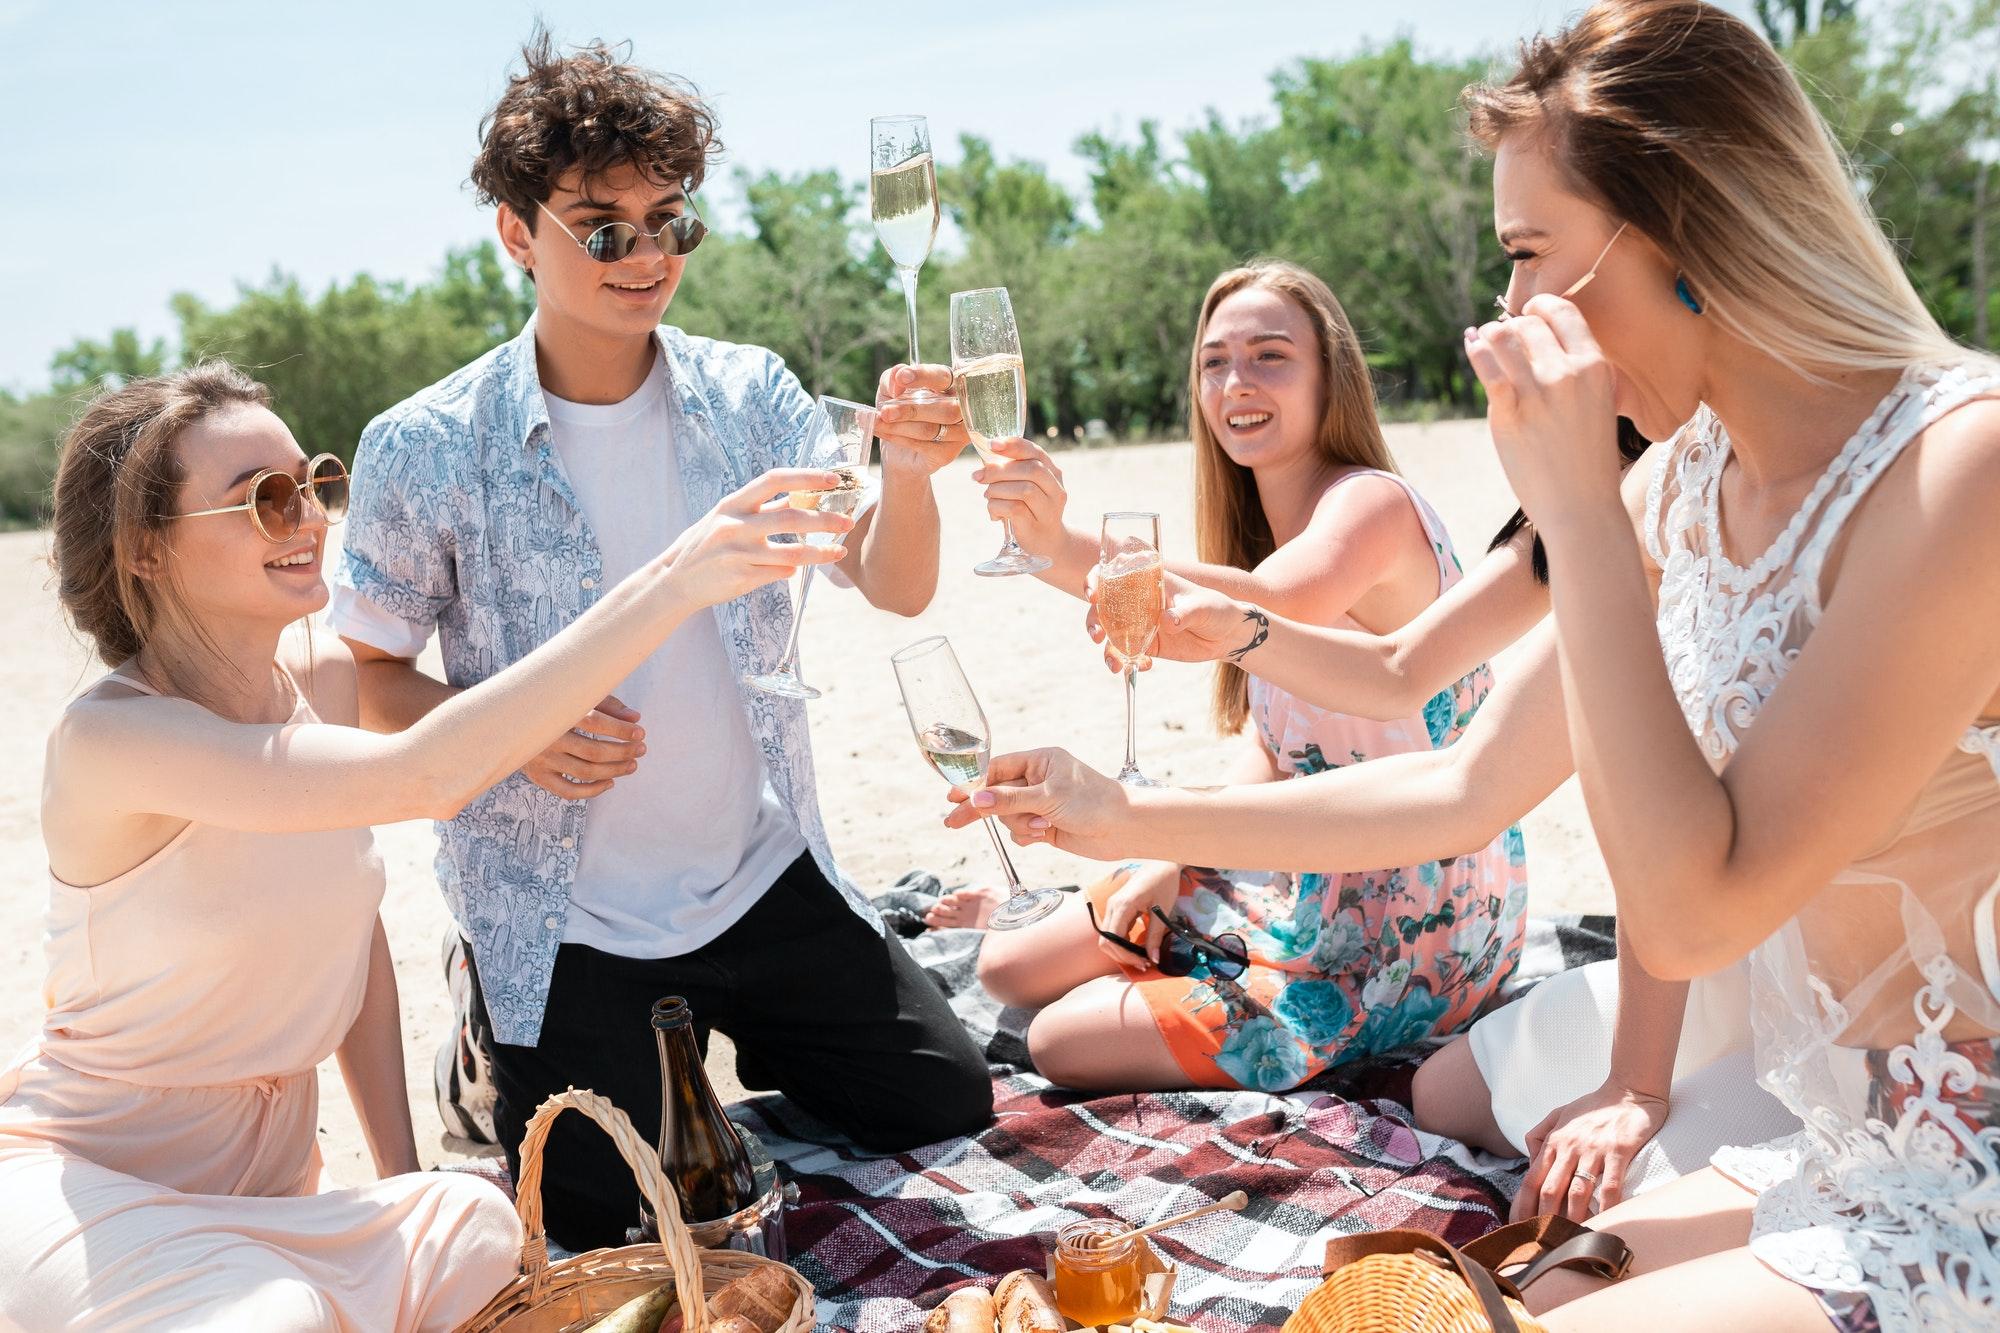 Seasonal feast at beach resort. Group of friends celebrating, resting, having fun on the beach in